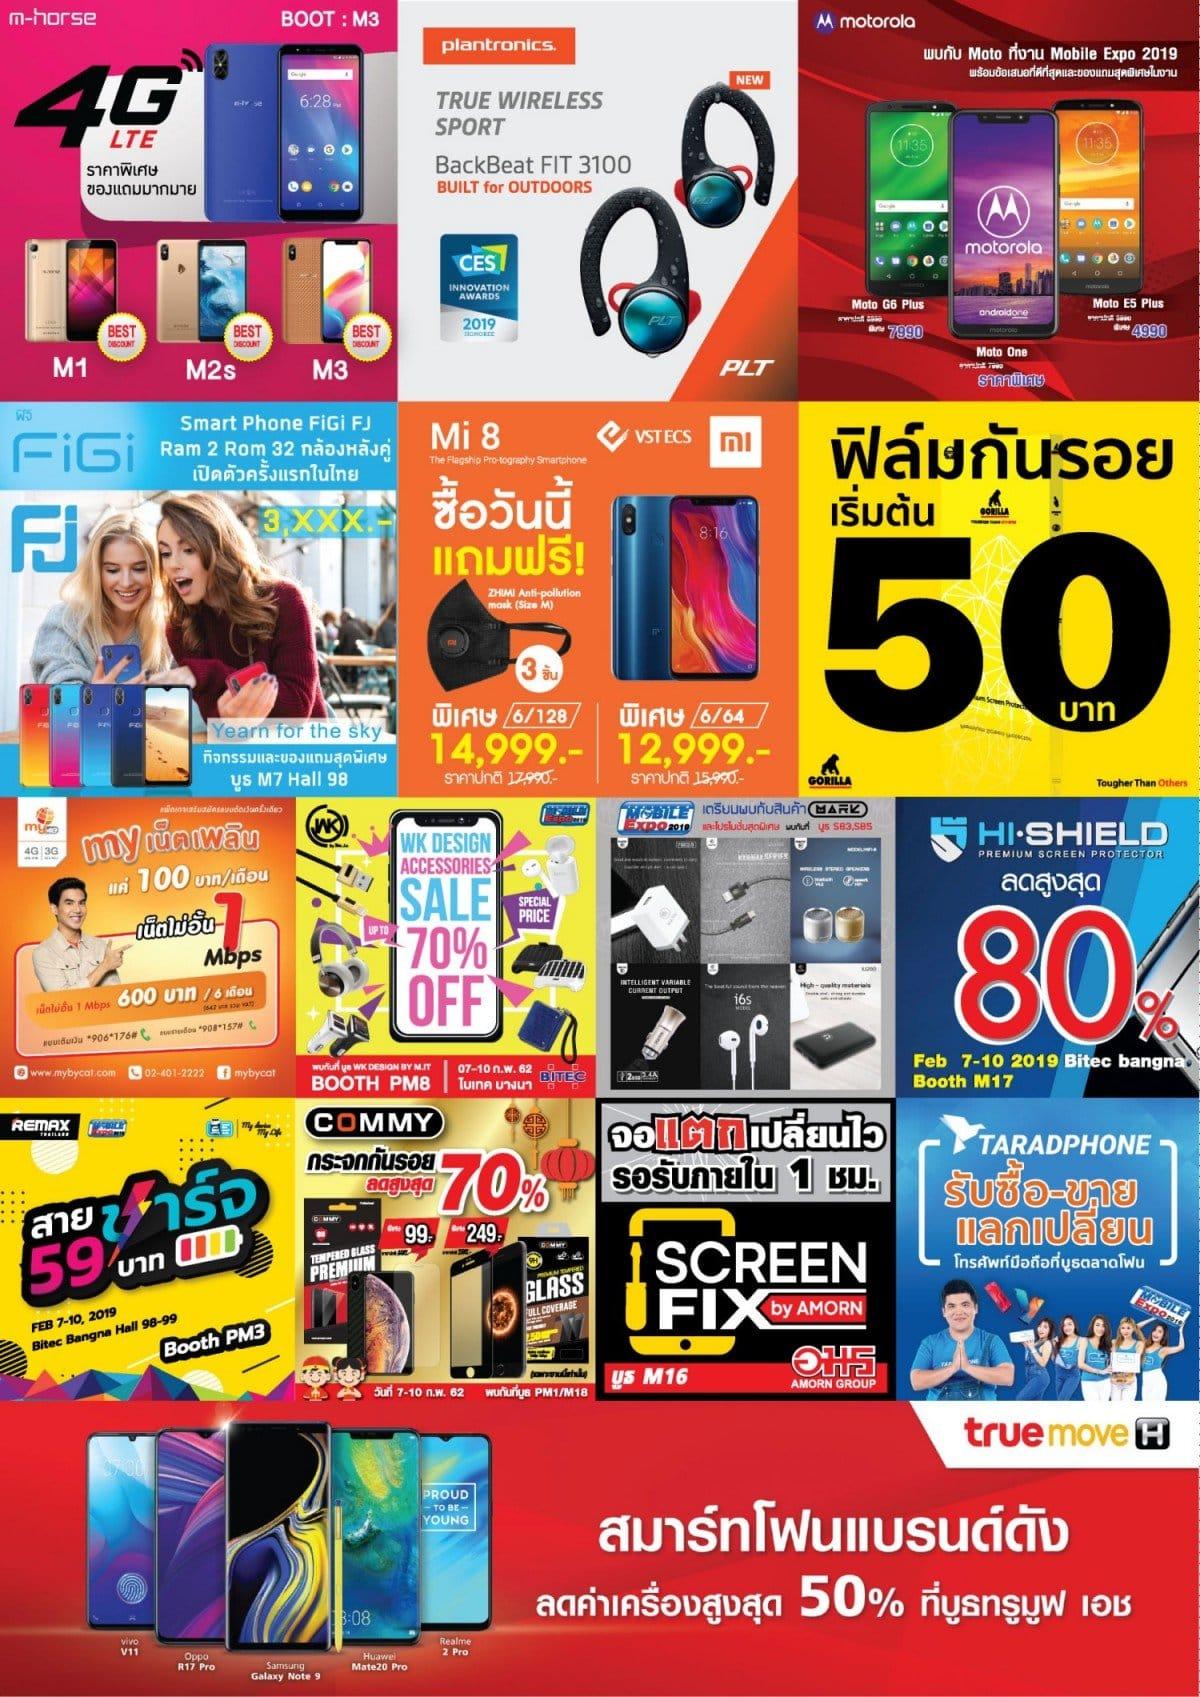 Tme 2019 #1 Brochure 03